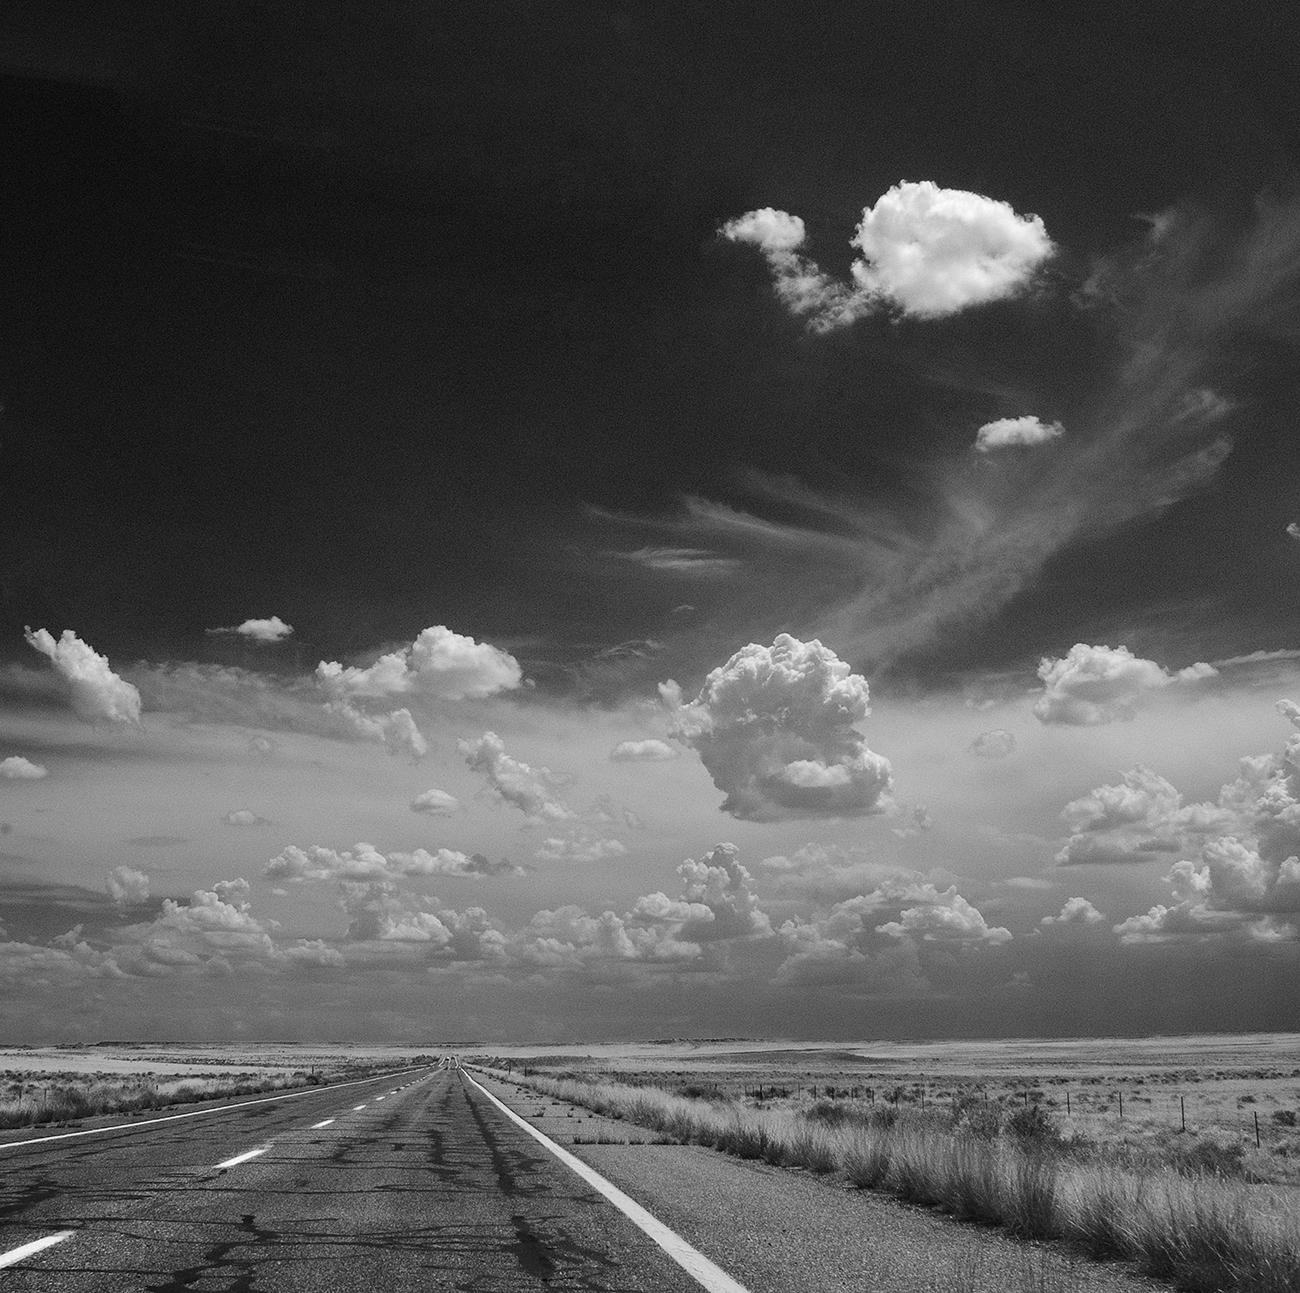 Route66_MelanieMasson-web-1300p2.jpg